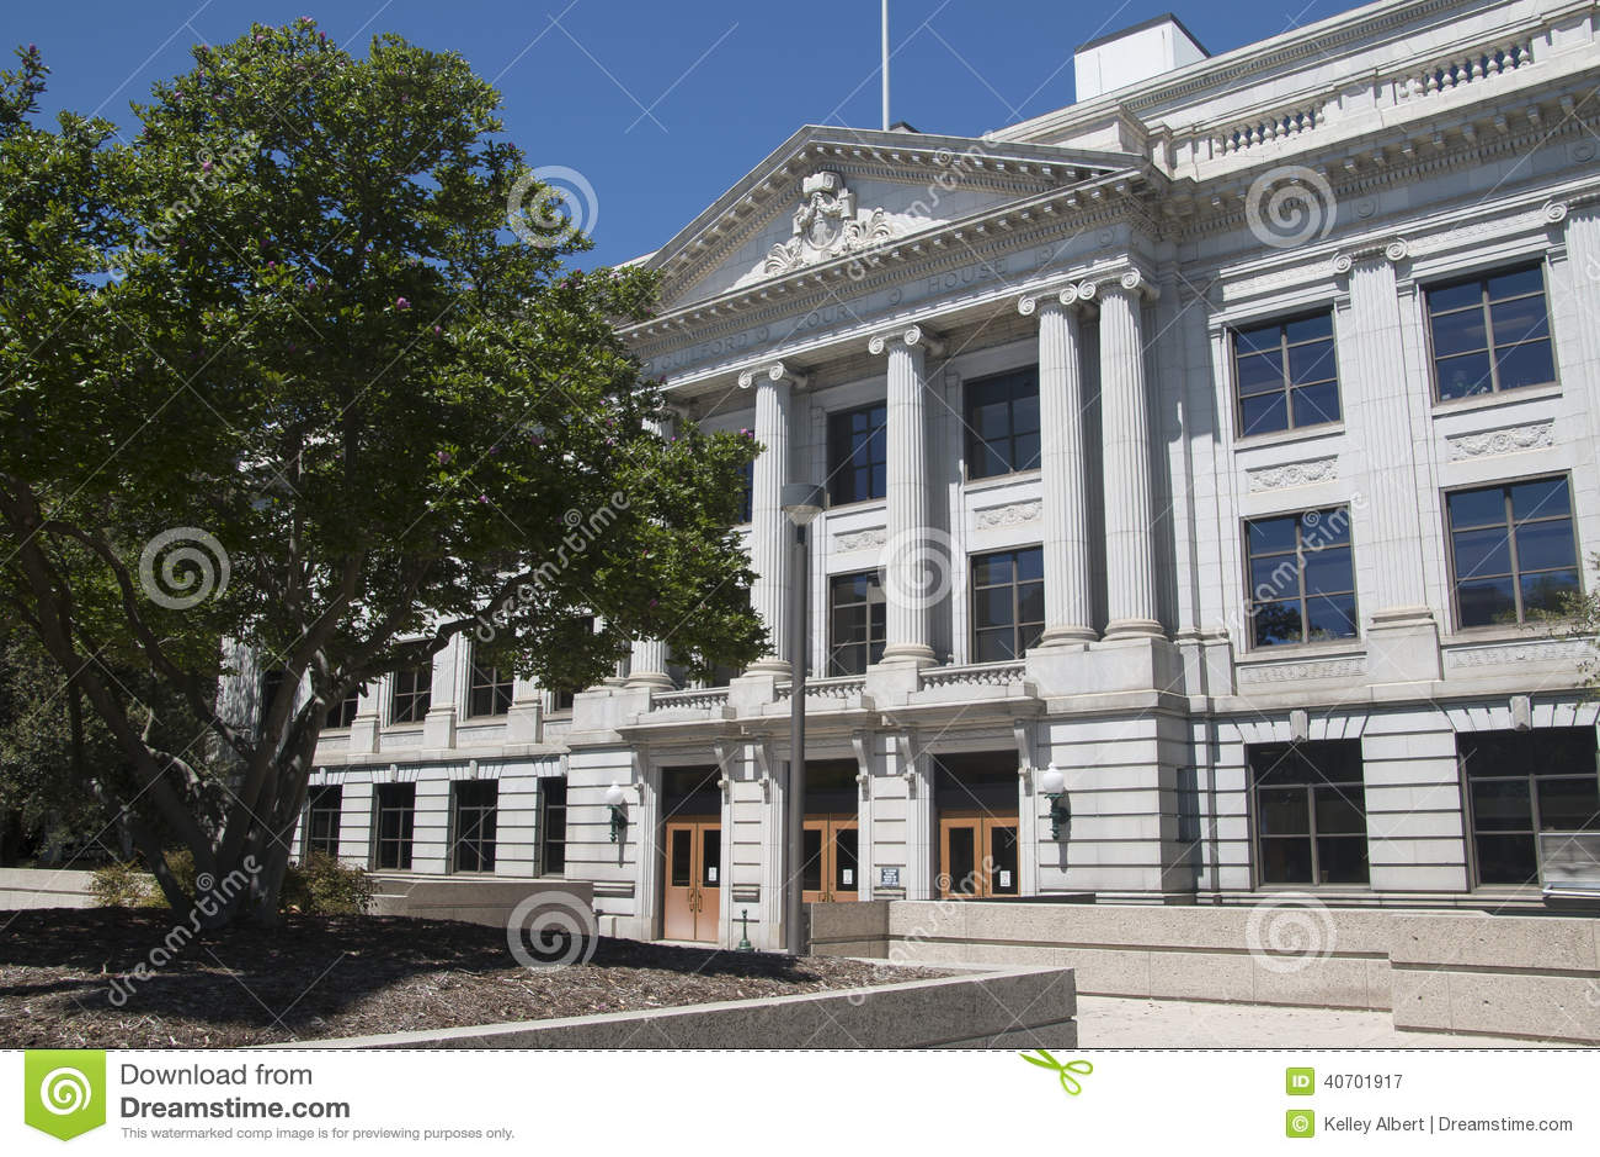 Courthouse in Greensboro, NC (North Carolina)